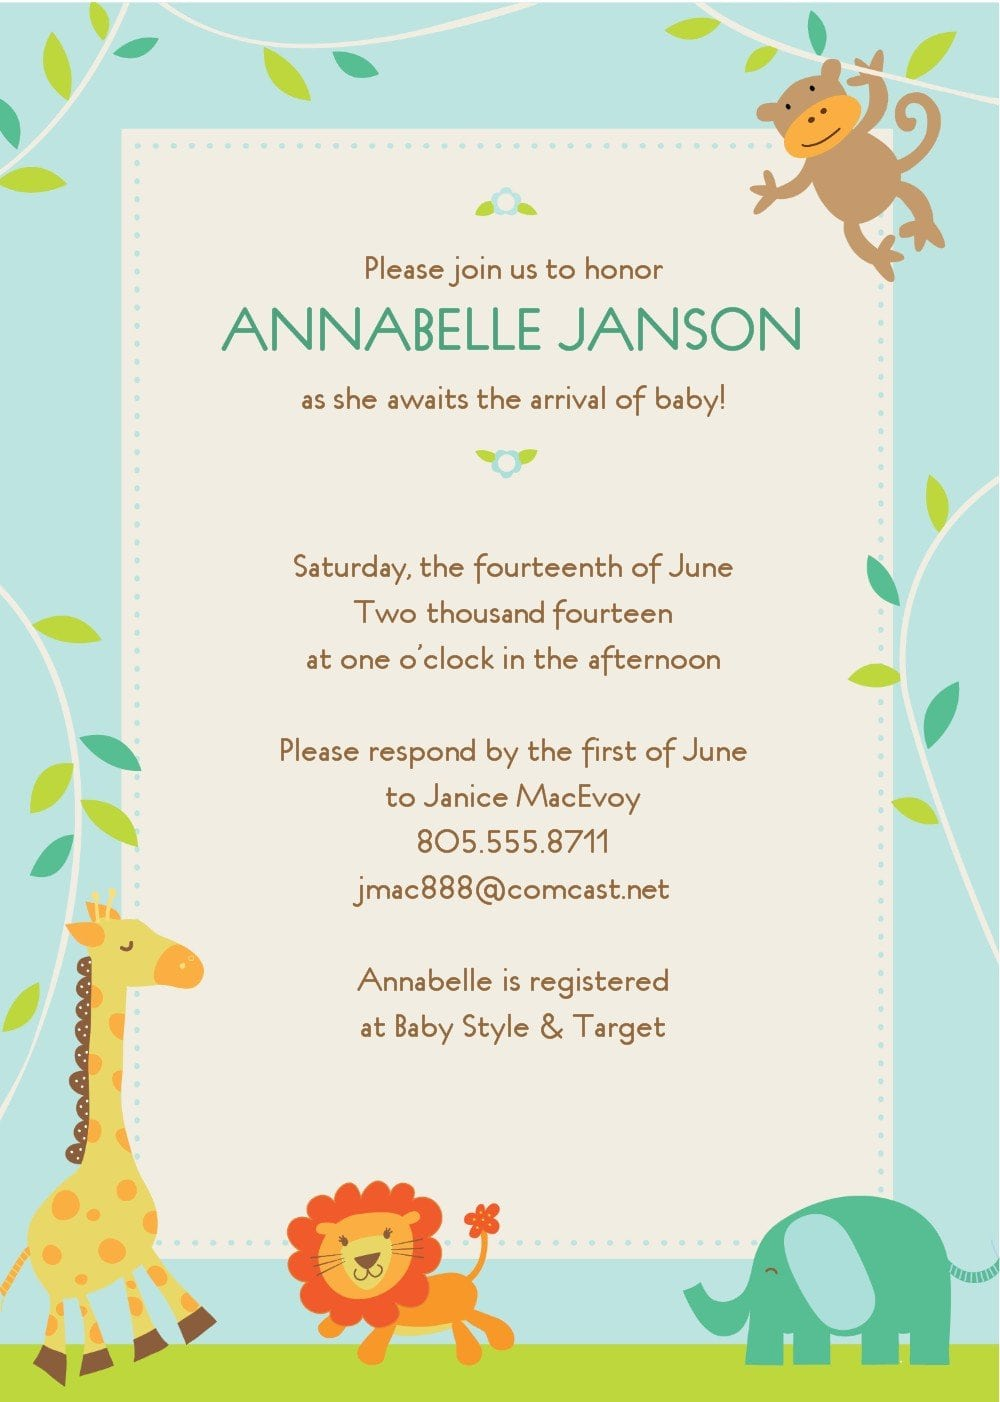 60Th Birthday Party Invitation Templates as adorable invitation ideas